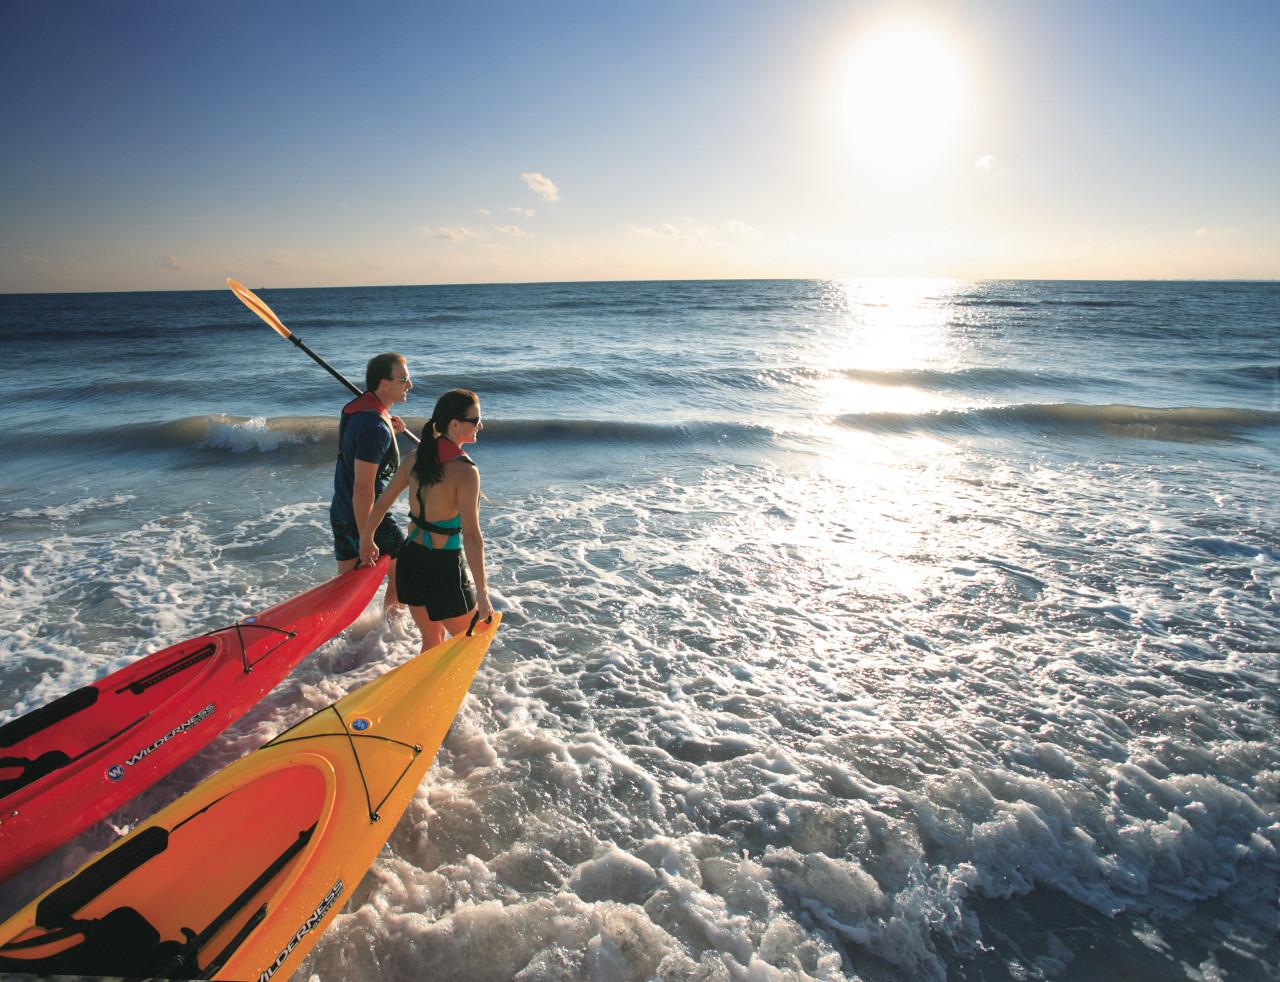 Kayaking Lee County, Florida